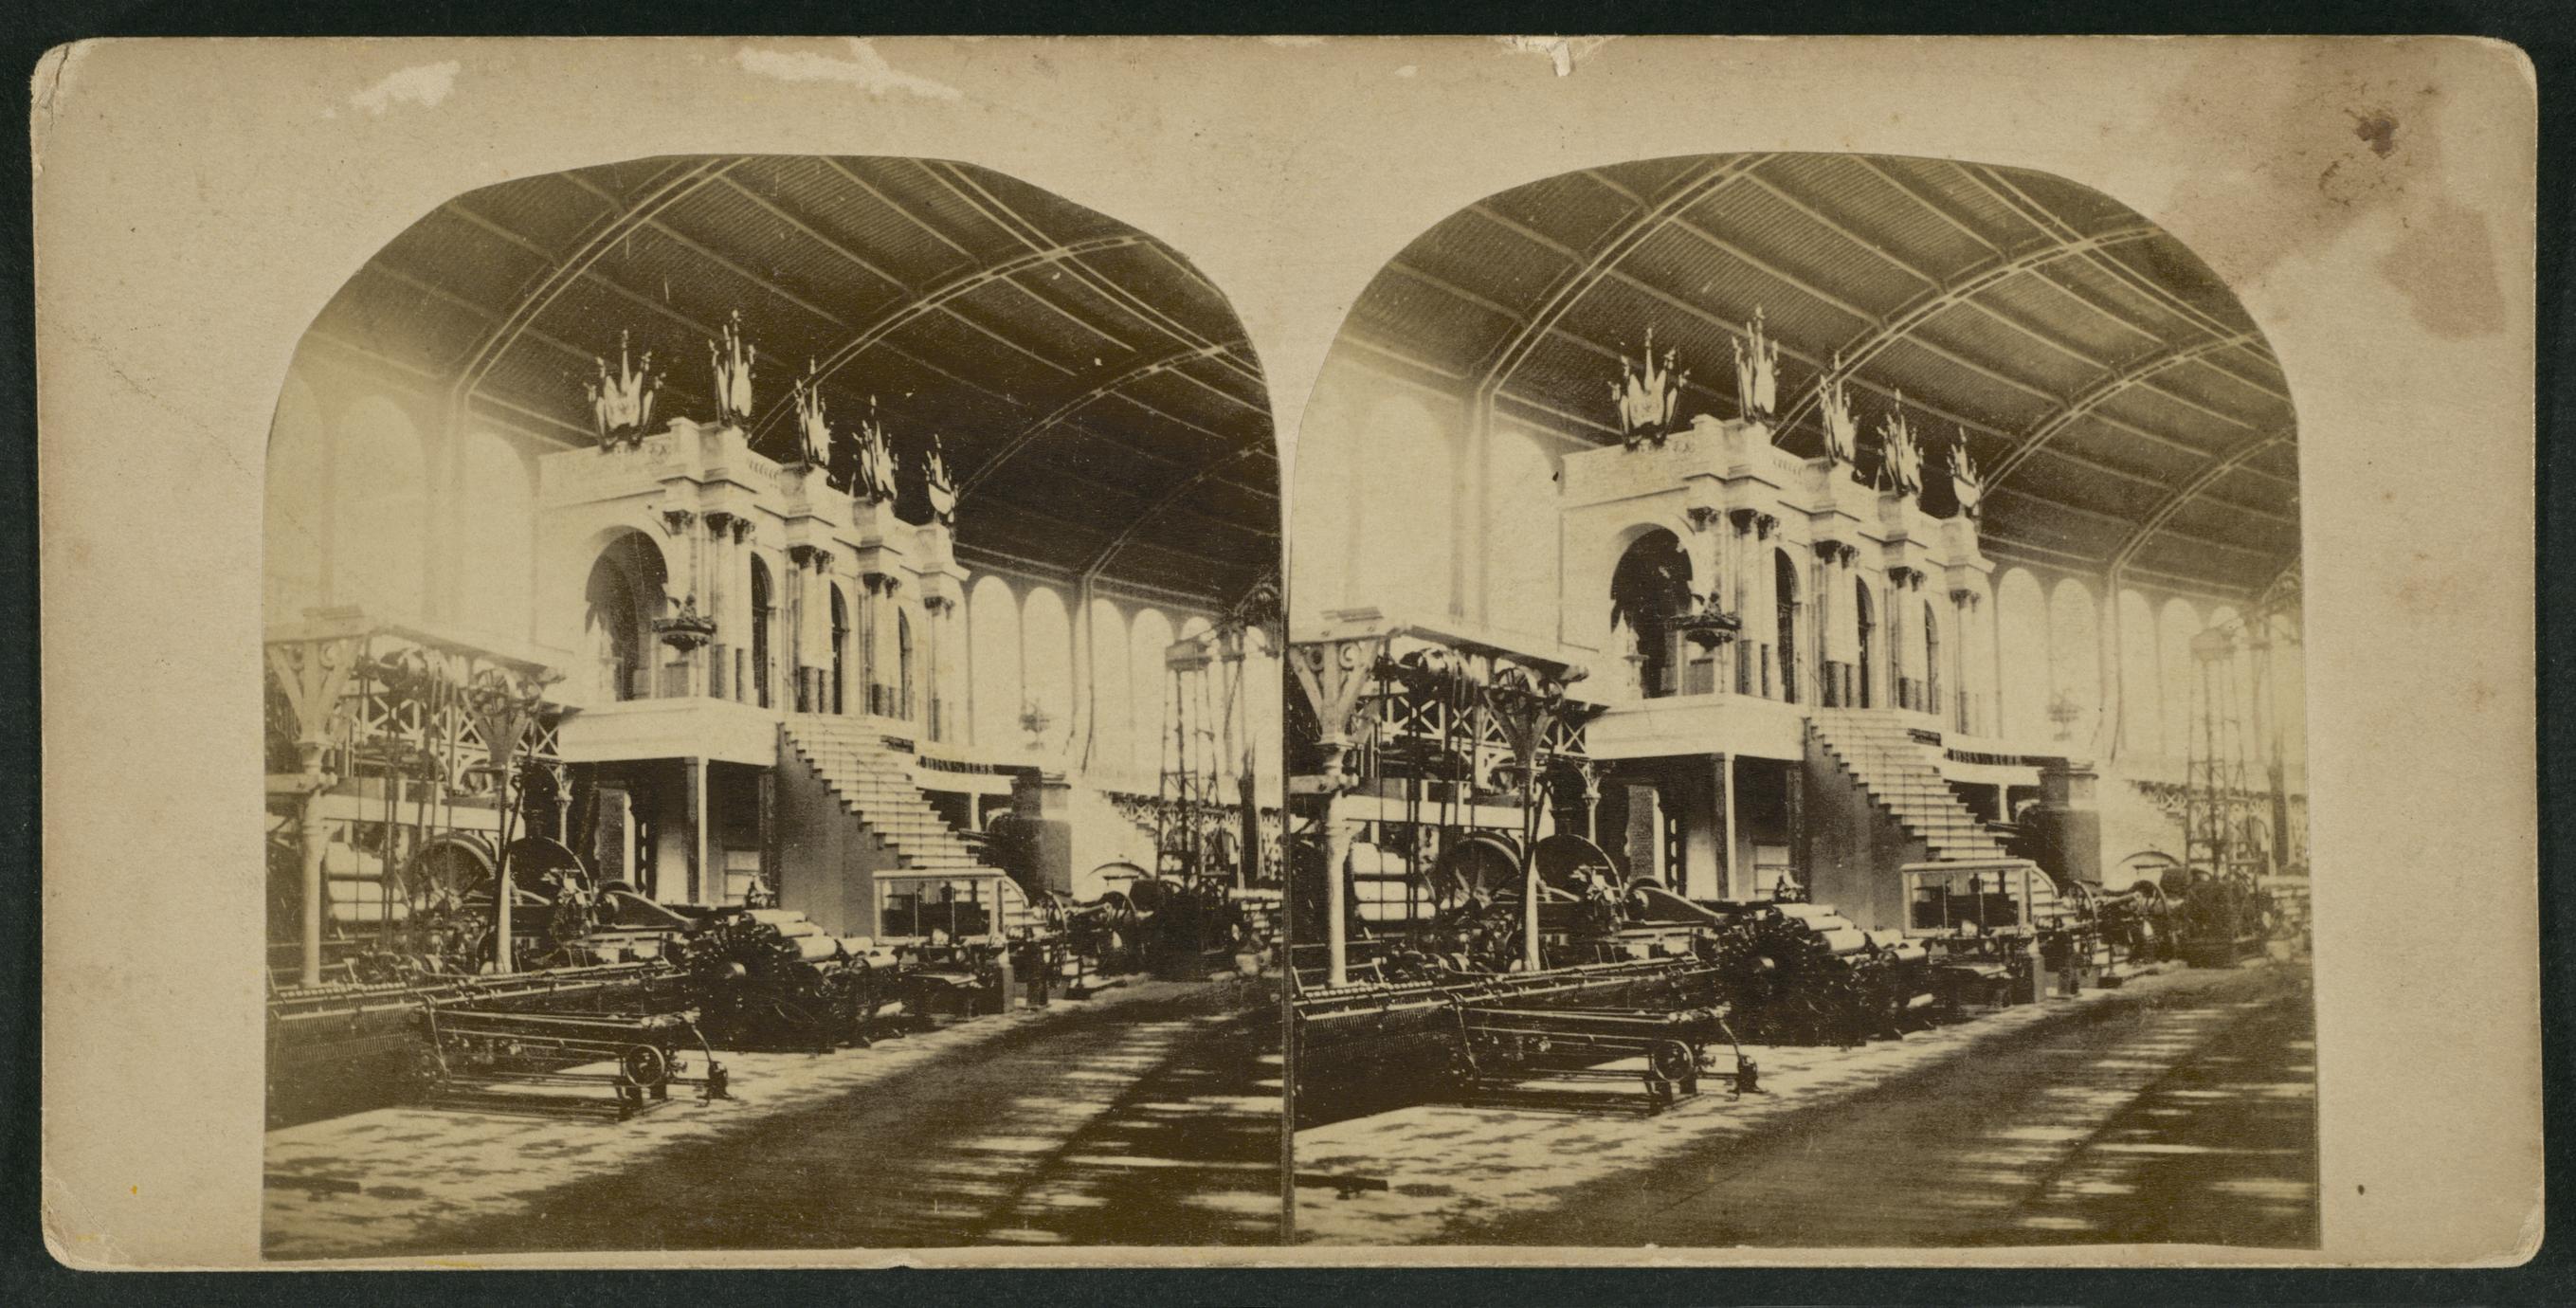 Paris Exposition 1867 (1 of 3)